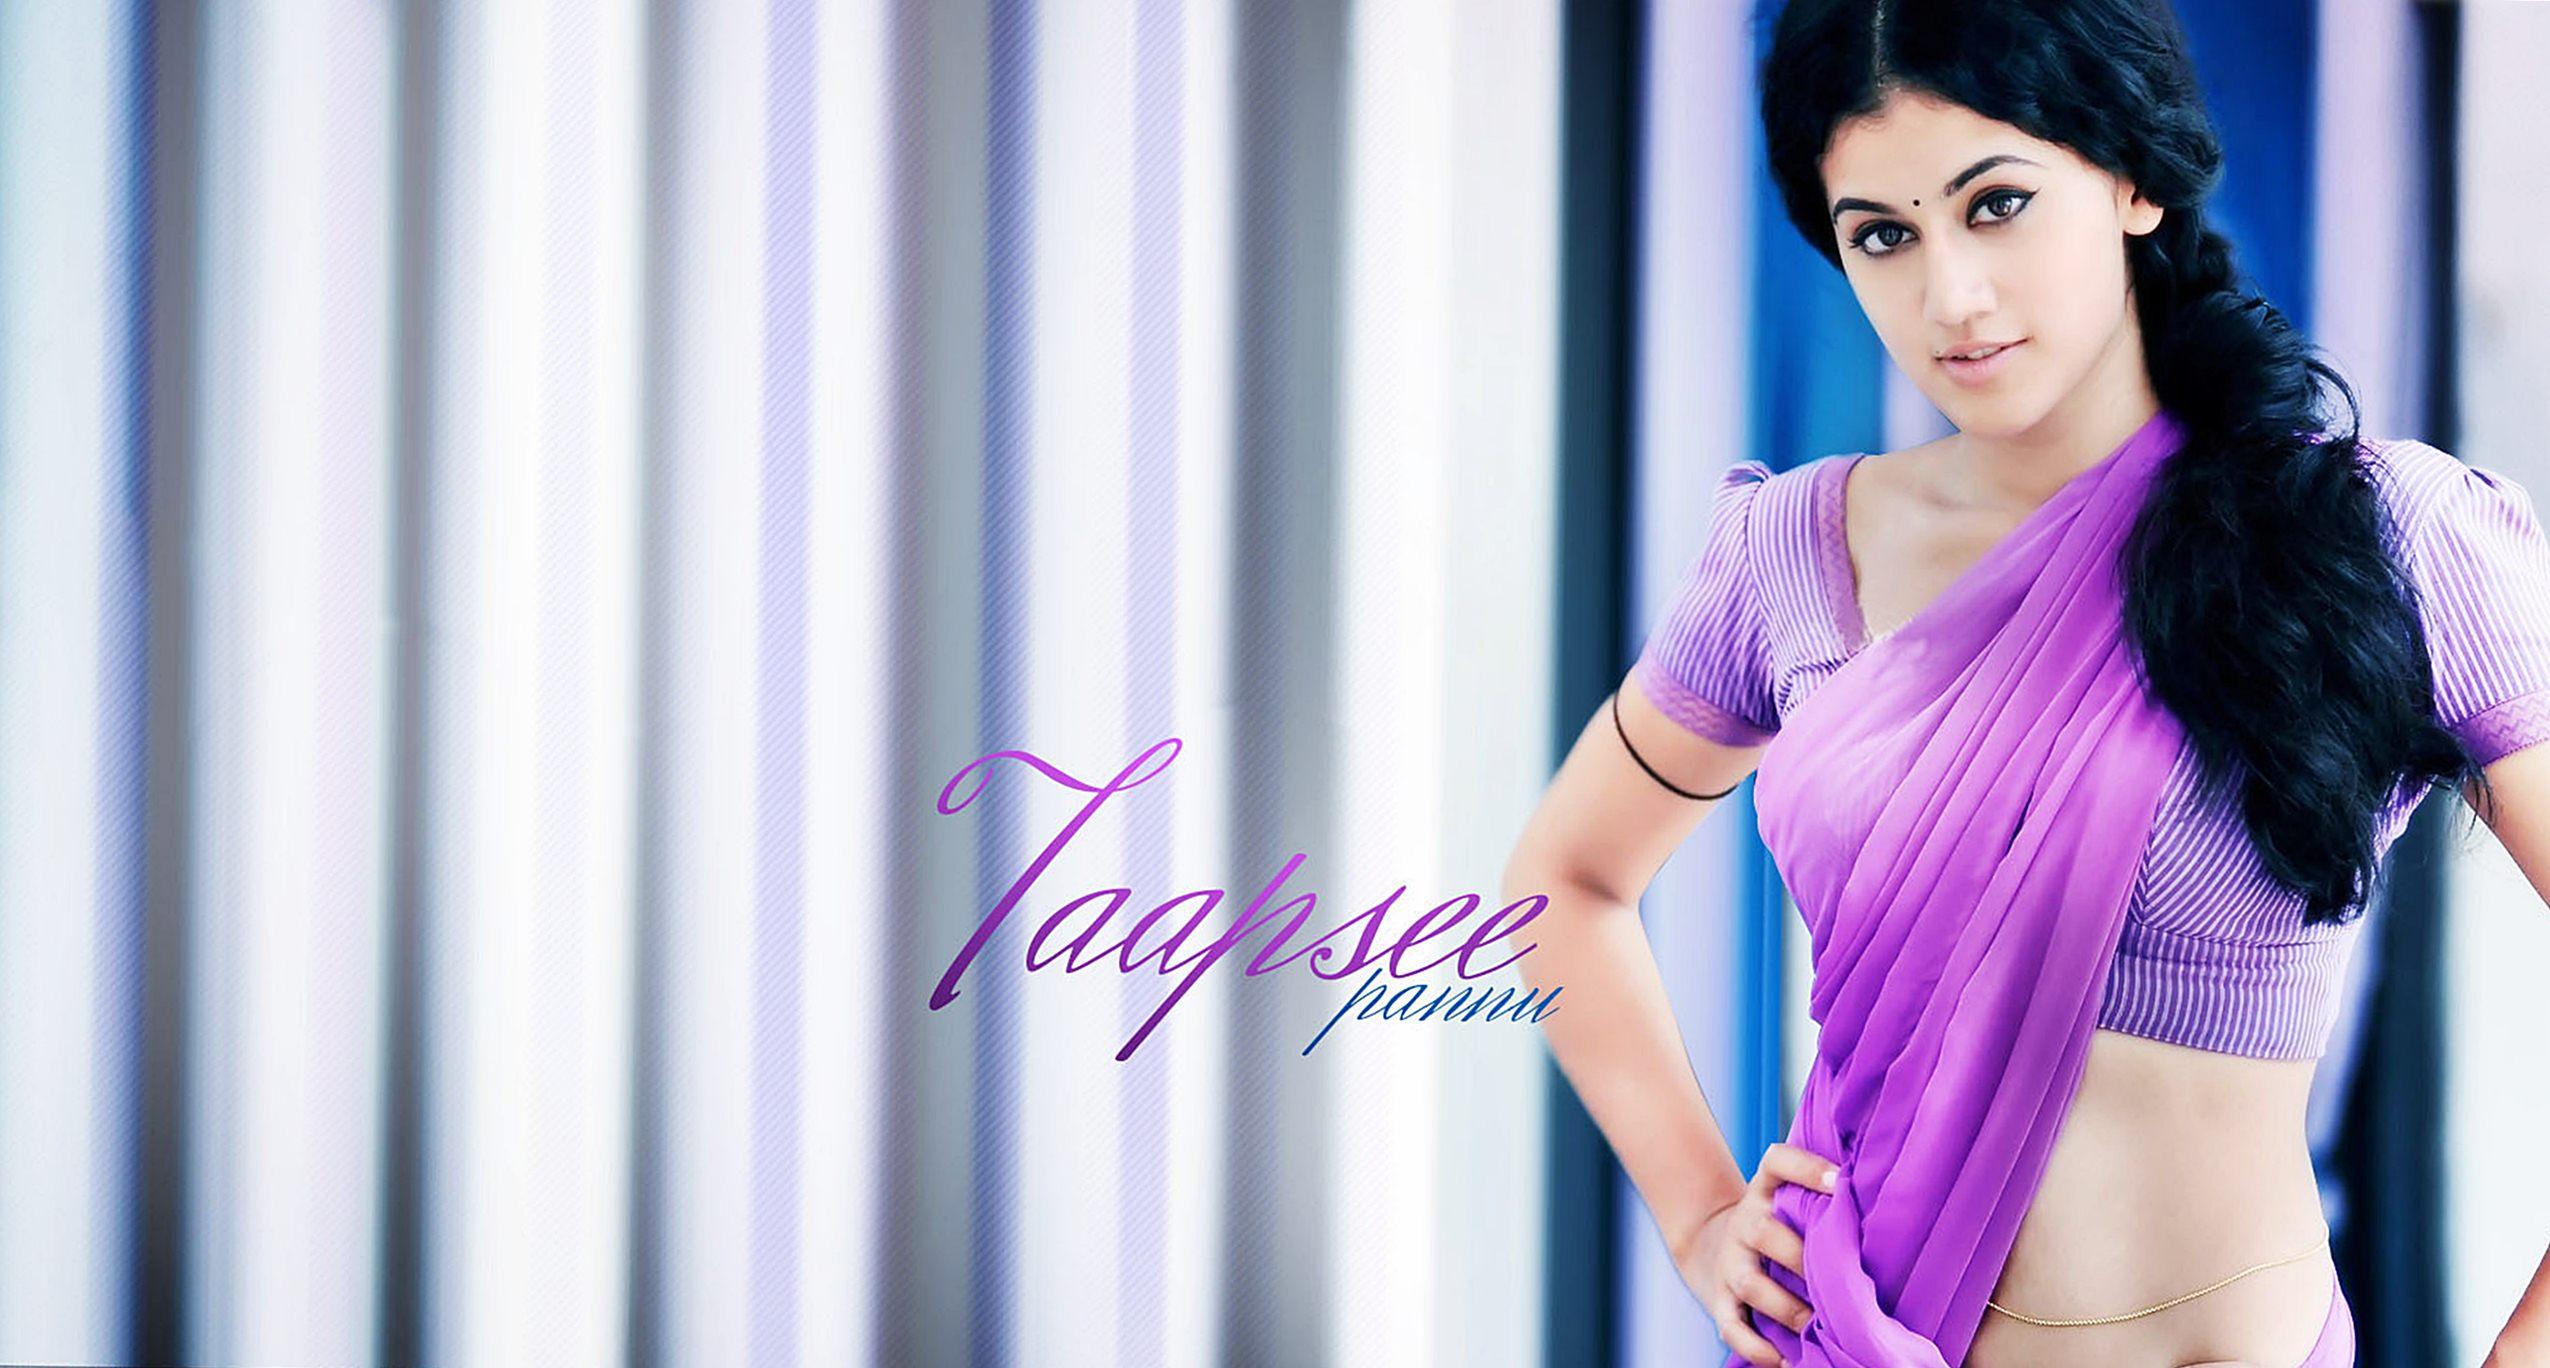 Purple Saree Dress HD Wallpaper Search more high Definition 1080p 2550x1368